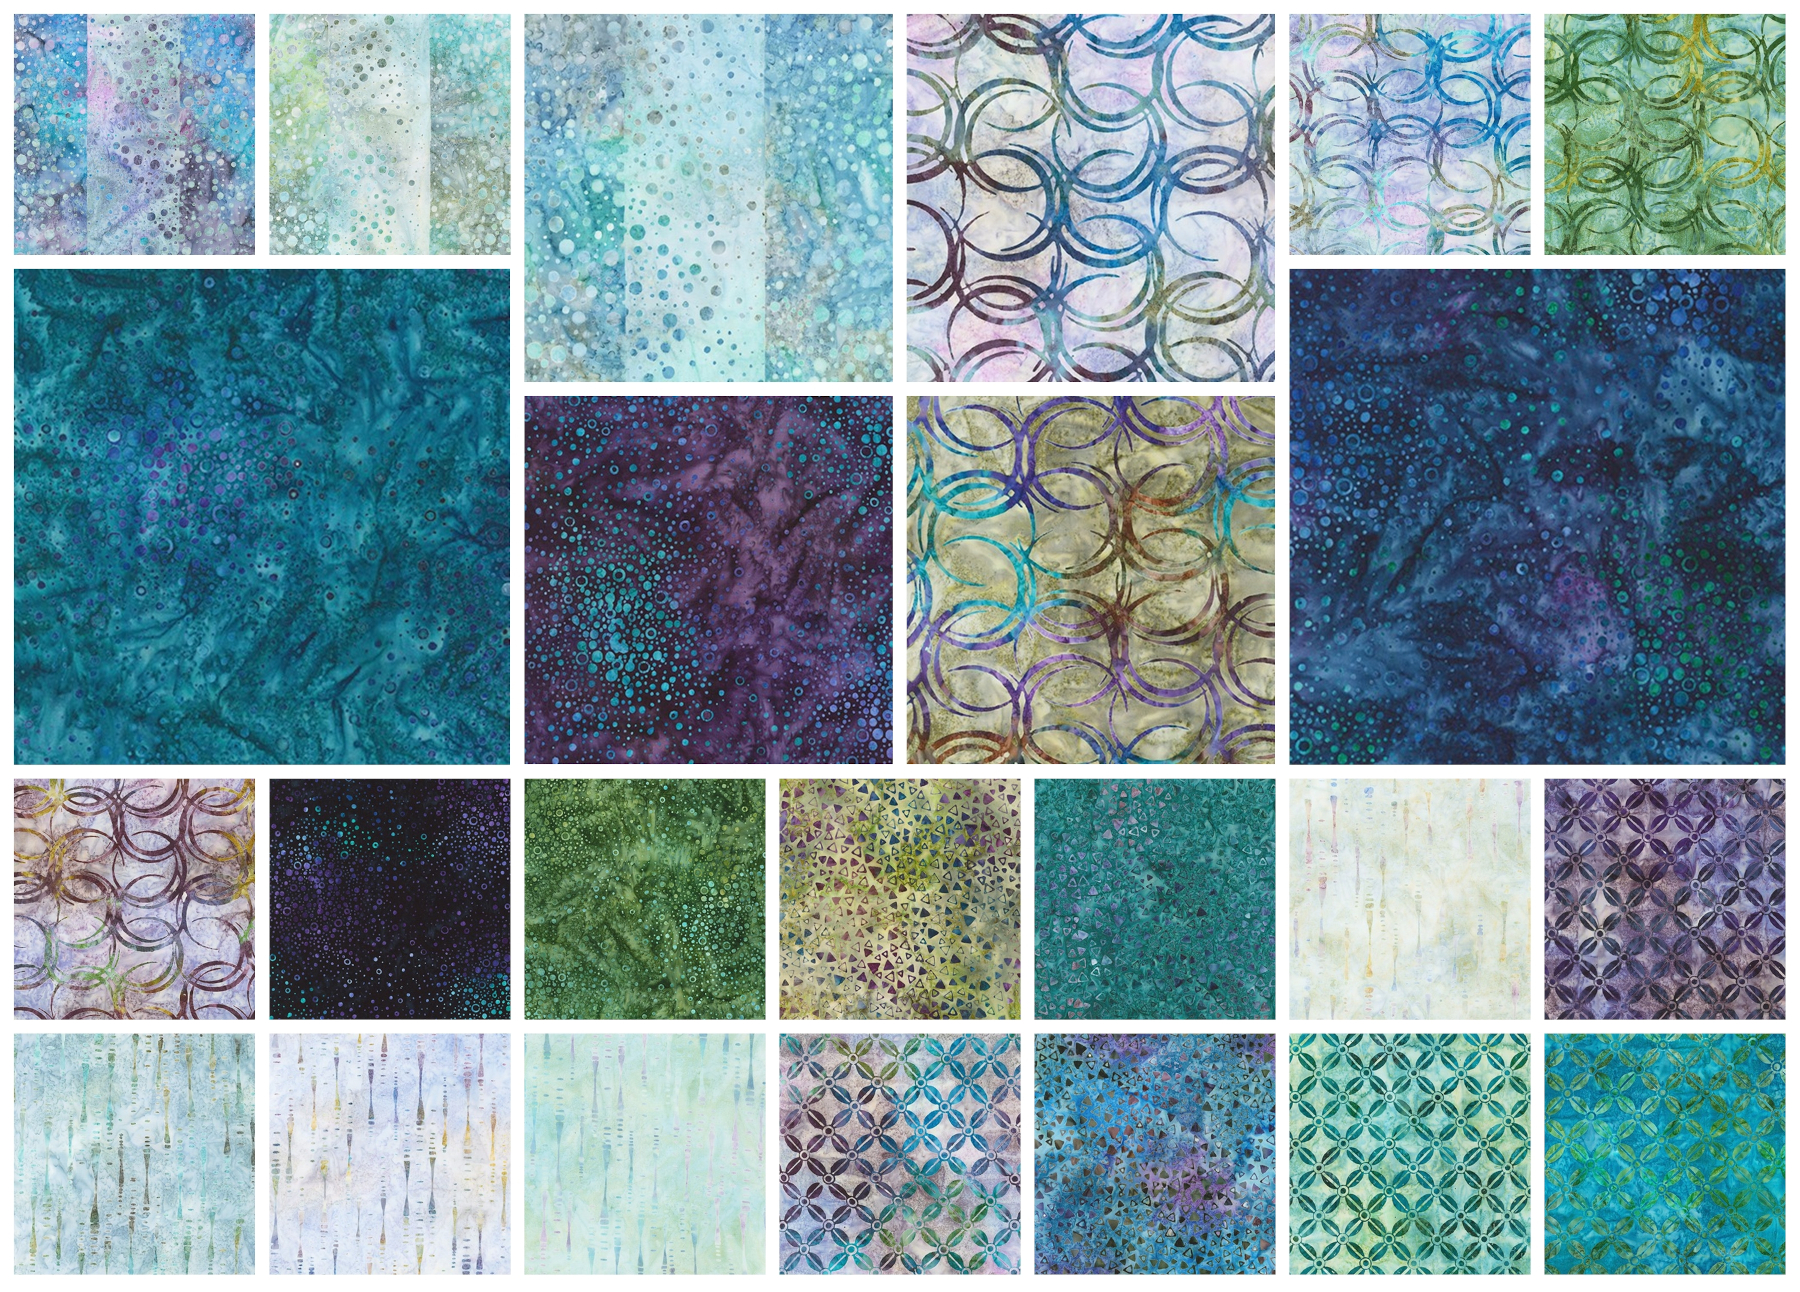 1 Yard Fabric Cuts 100/% Cotton Batiks Designed by Michael Mrowka /& Debra Lunn One of a Kind Package 103C 4 Lot of